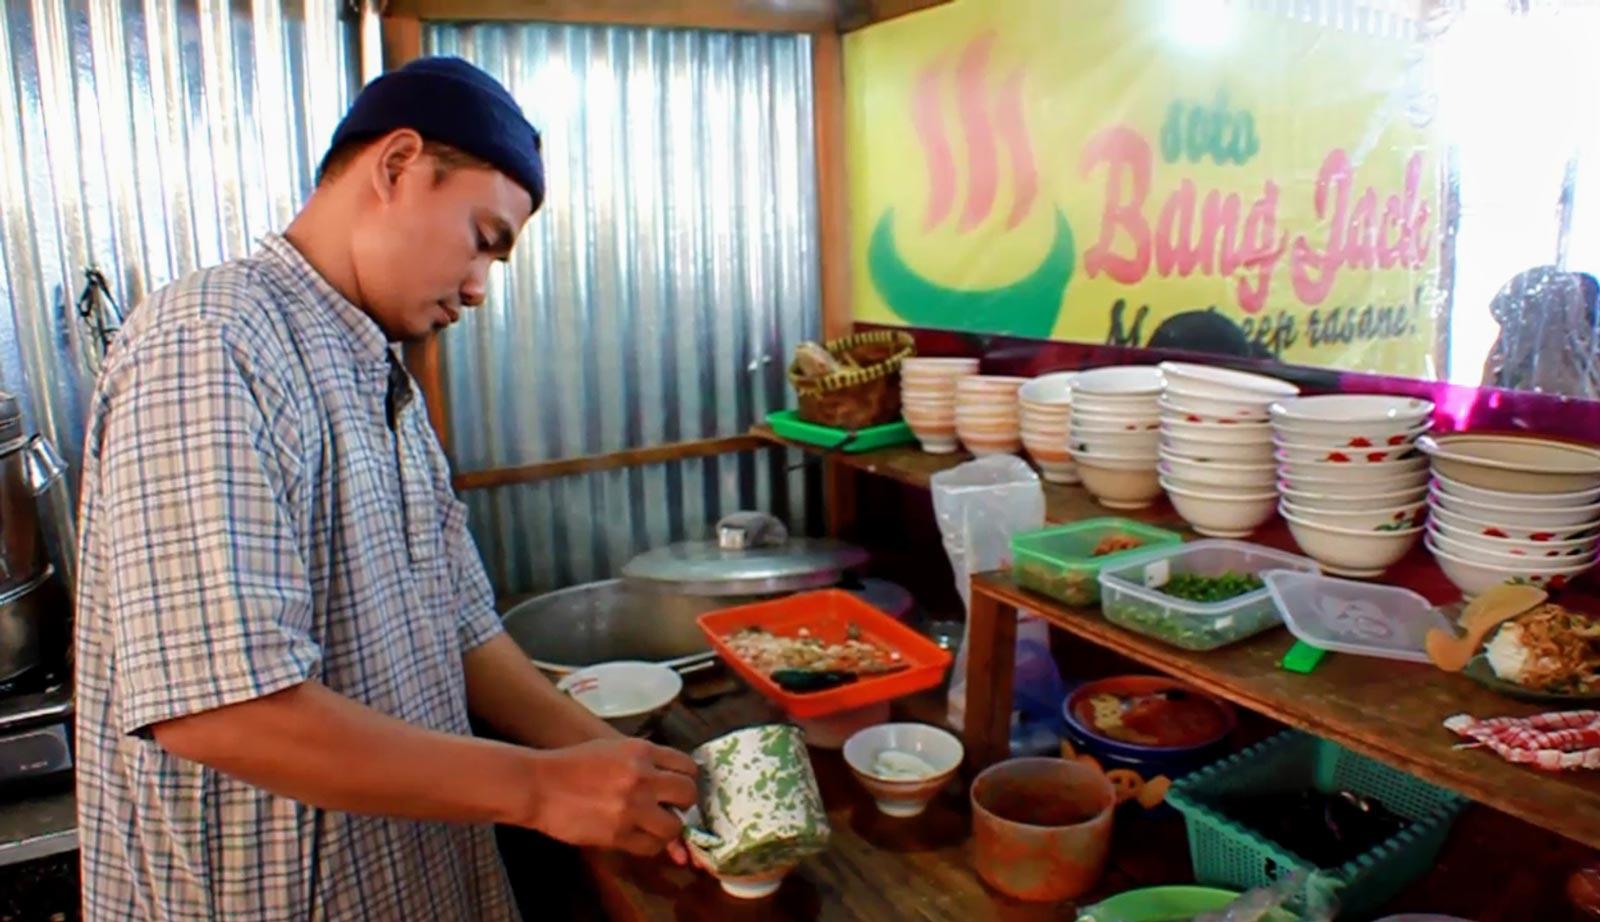 Former terrorist Joko Tri Harmanto, also known as Jack Harun, prepares traditional Indonesian soto in his restaurant in Central Java. Photo: Kusumasari Ayuningtyas